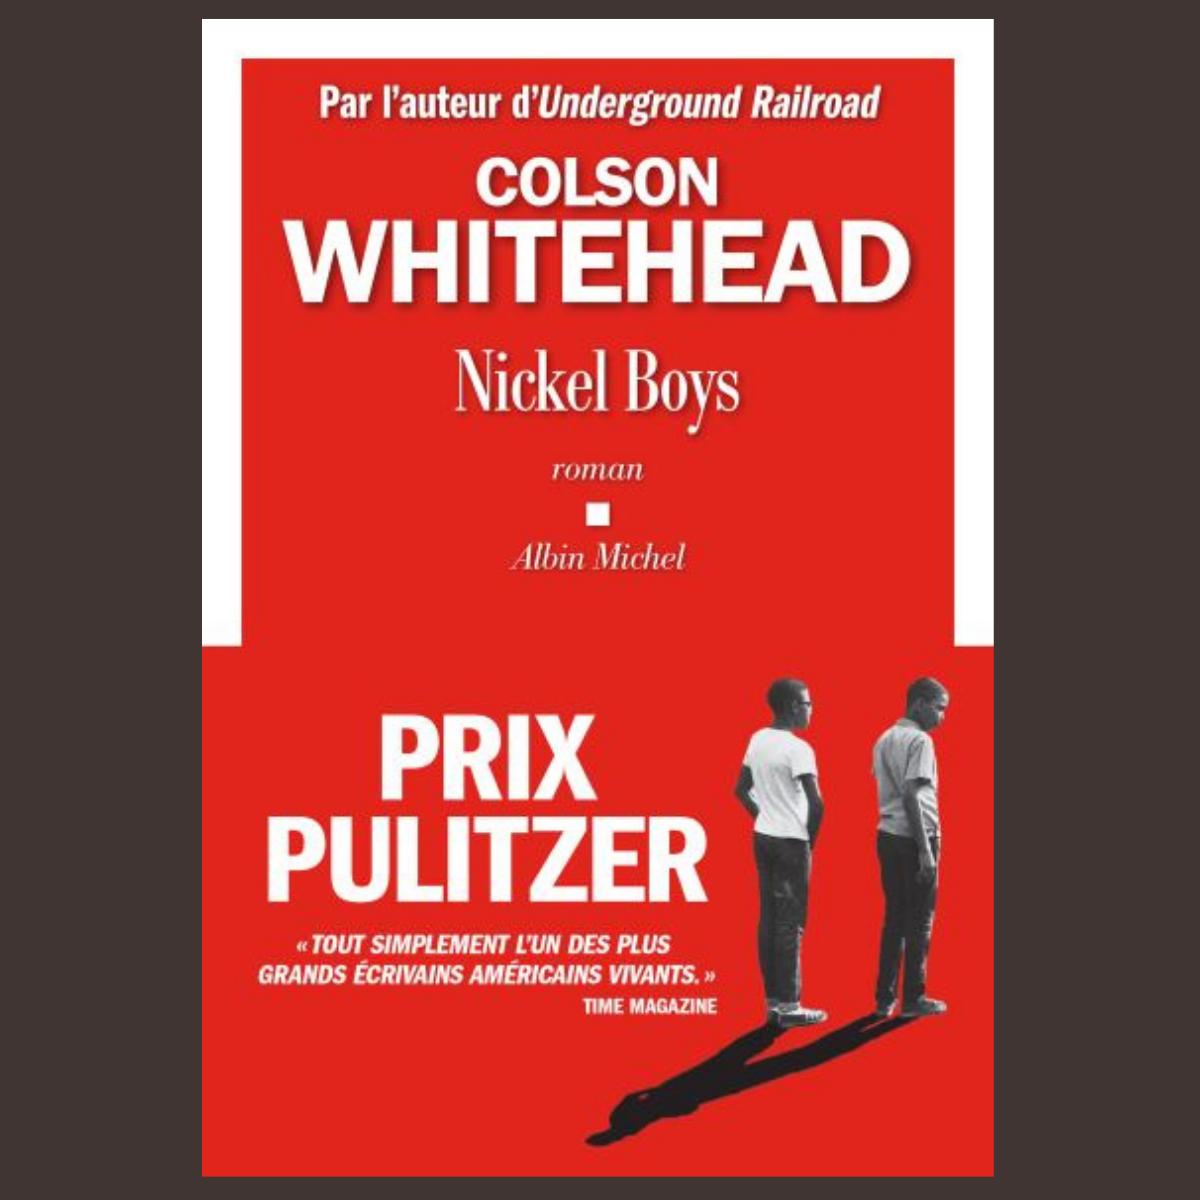 Nickel Boys - Colson Whitehead (Albin Michel))